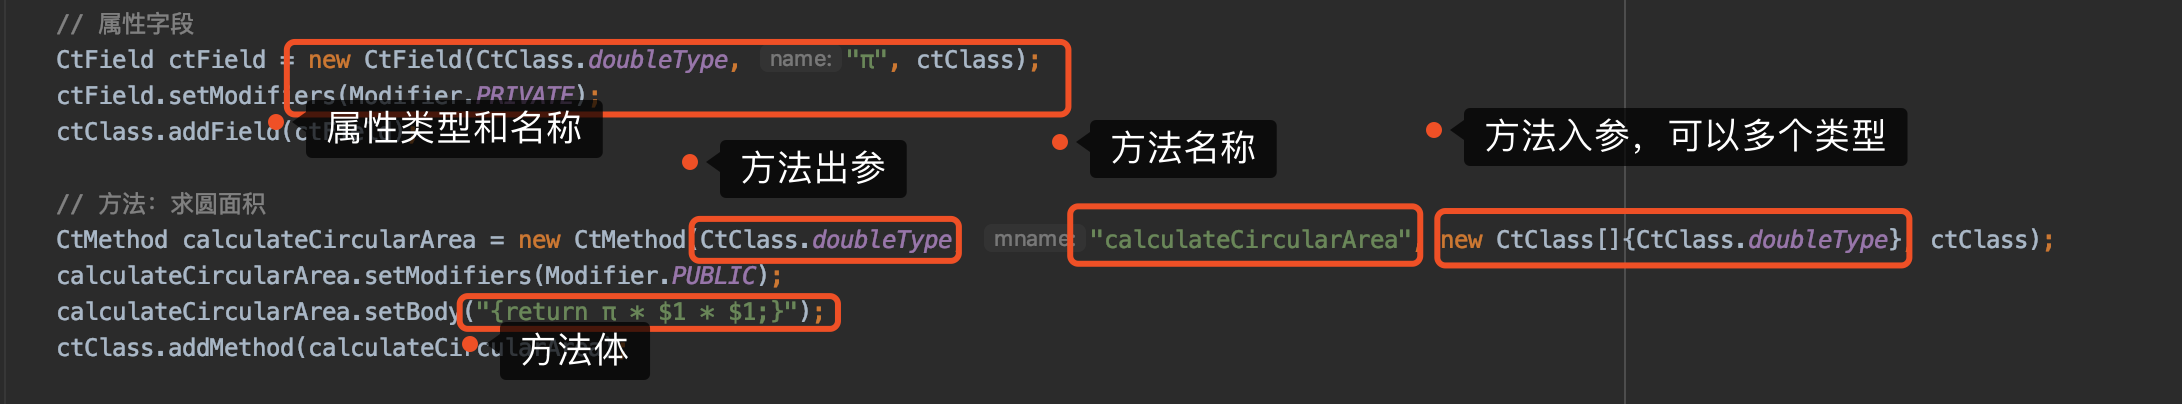 Javassist 创建类方法入参描述